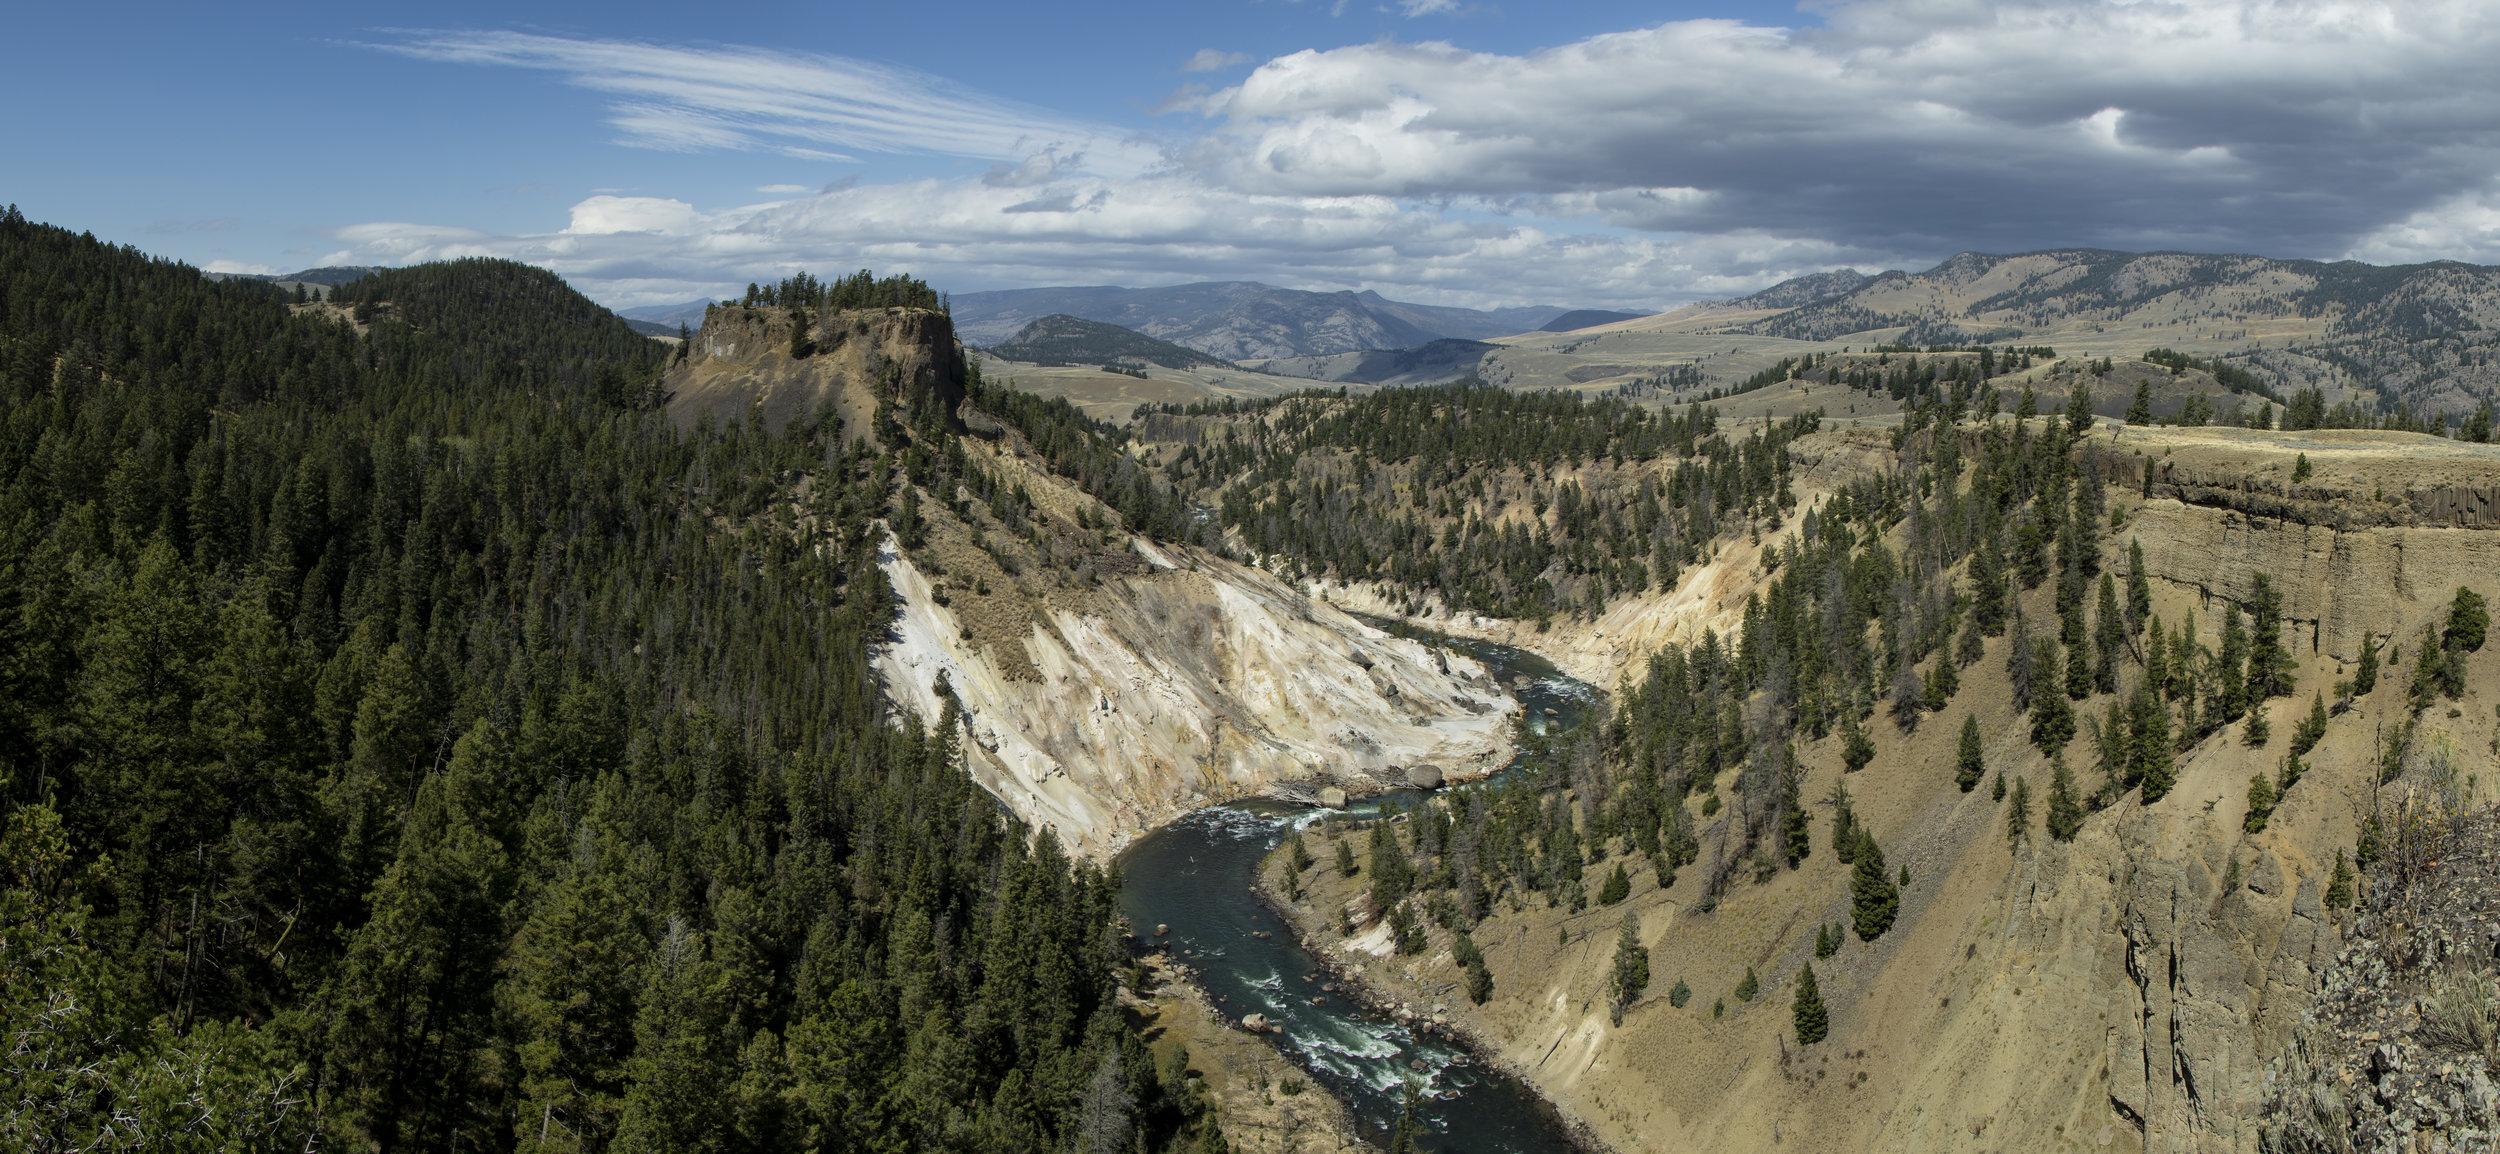 Montana Mountain Landscape